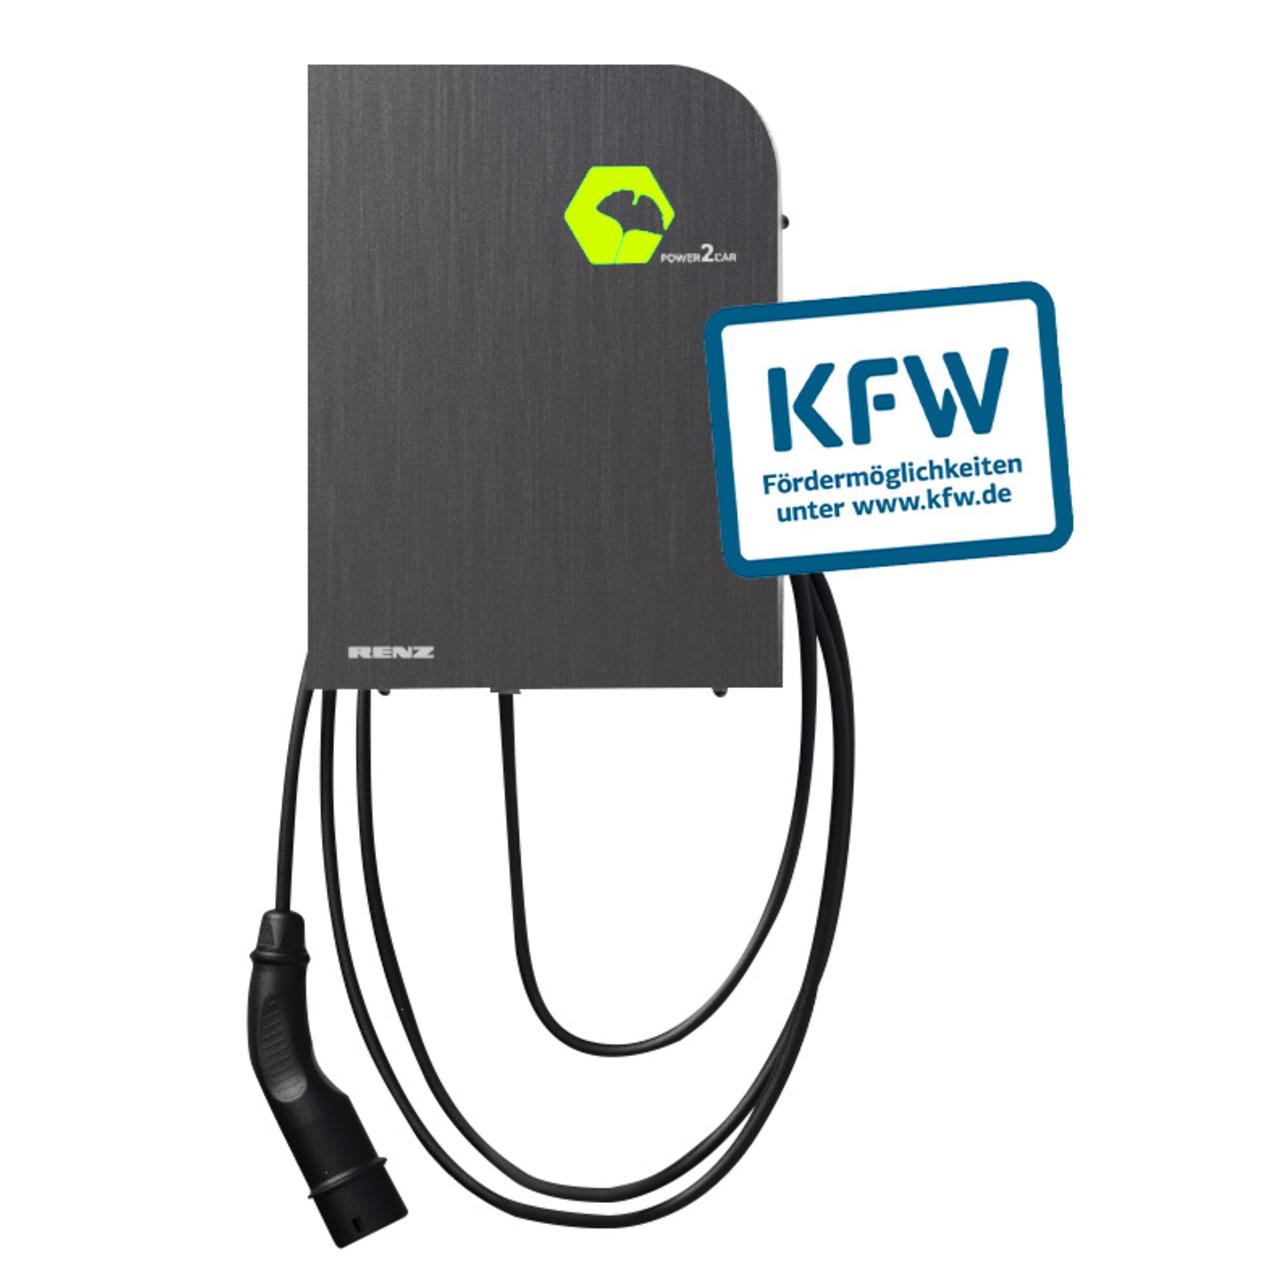 Renz Wallbox POWER2CAR STEEL- 3-7 - 11 kW- 5-m-Kabel- förderfähig